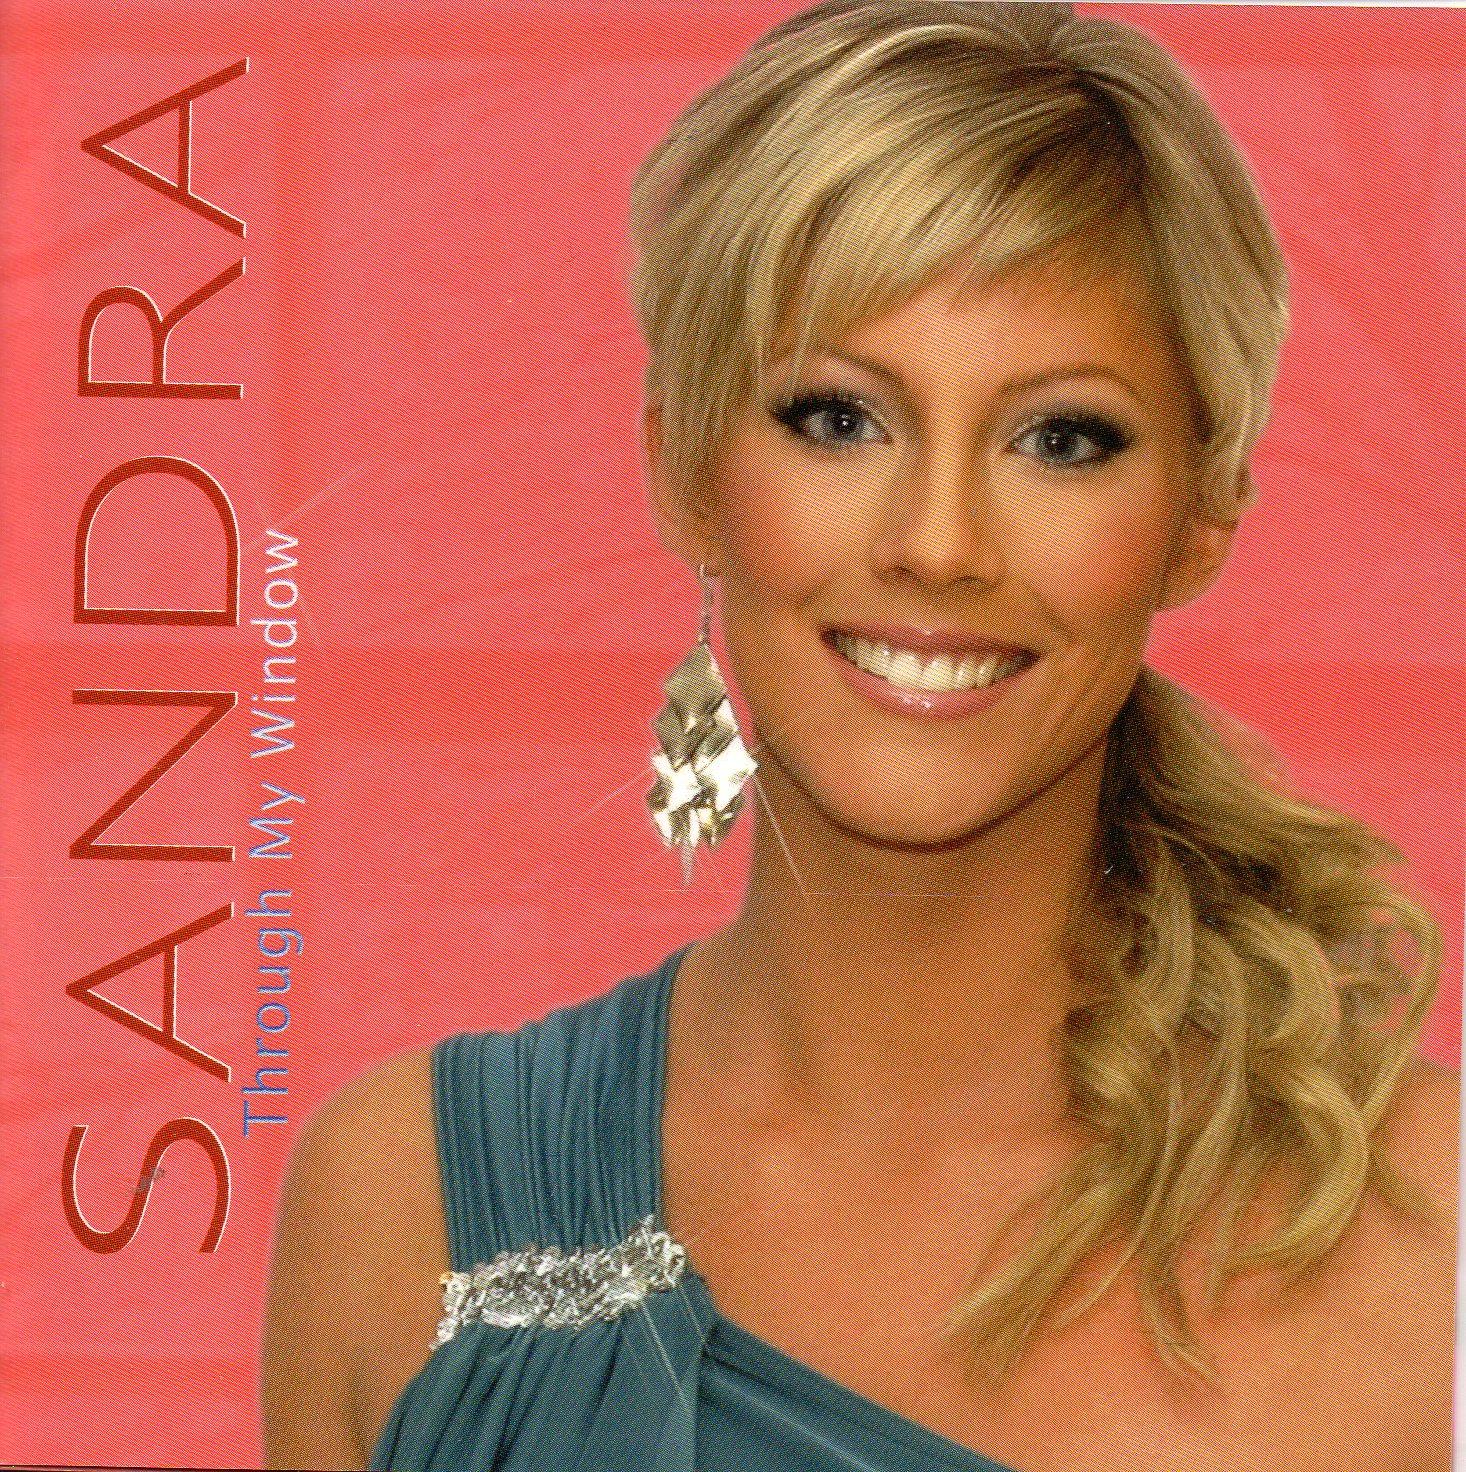 EUROVISION 2006 ESTONIE : SANDRA OXENRYD - Through the window 2-track CARD SLEEVE - CD single